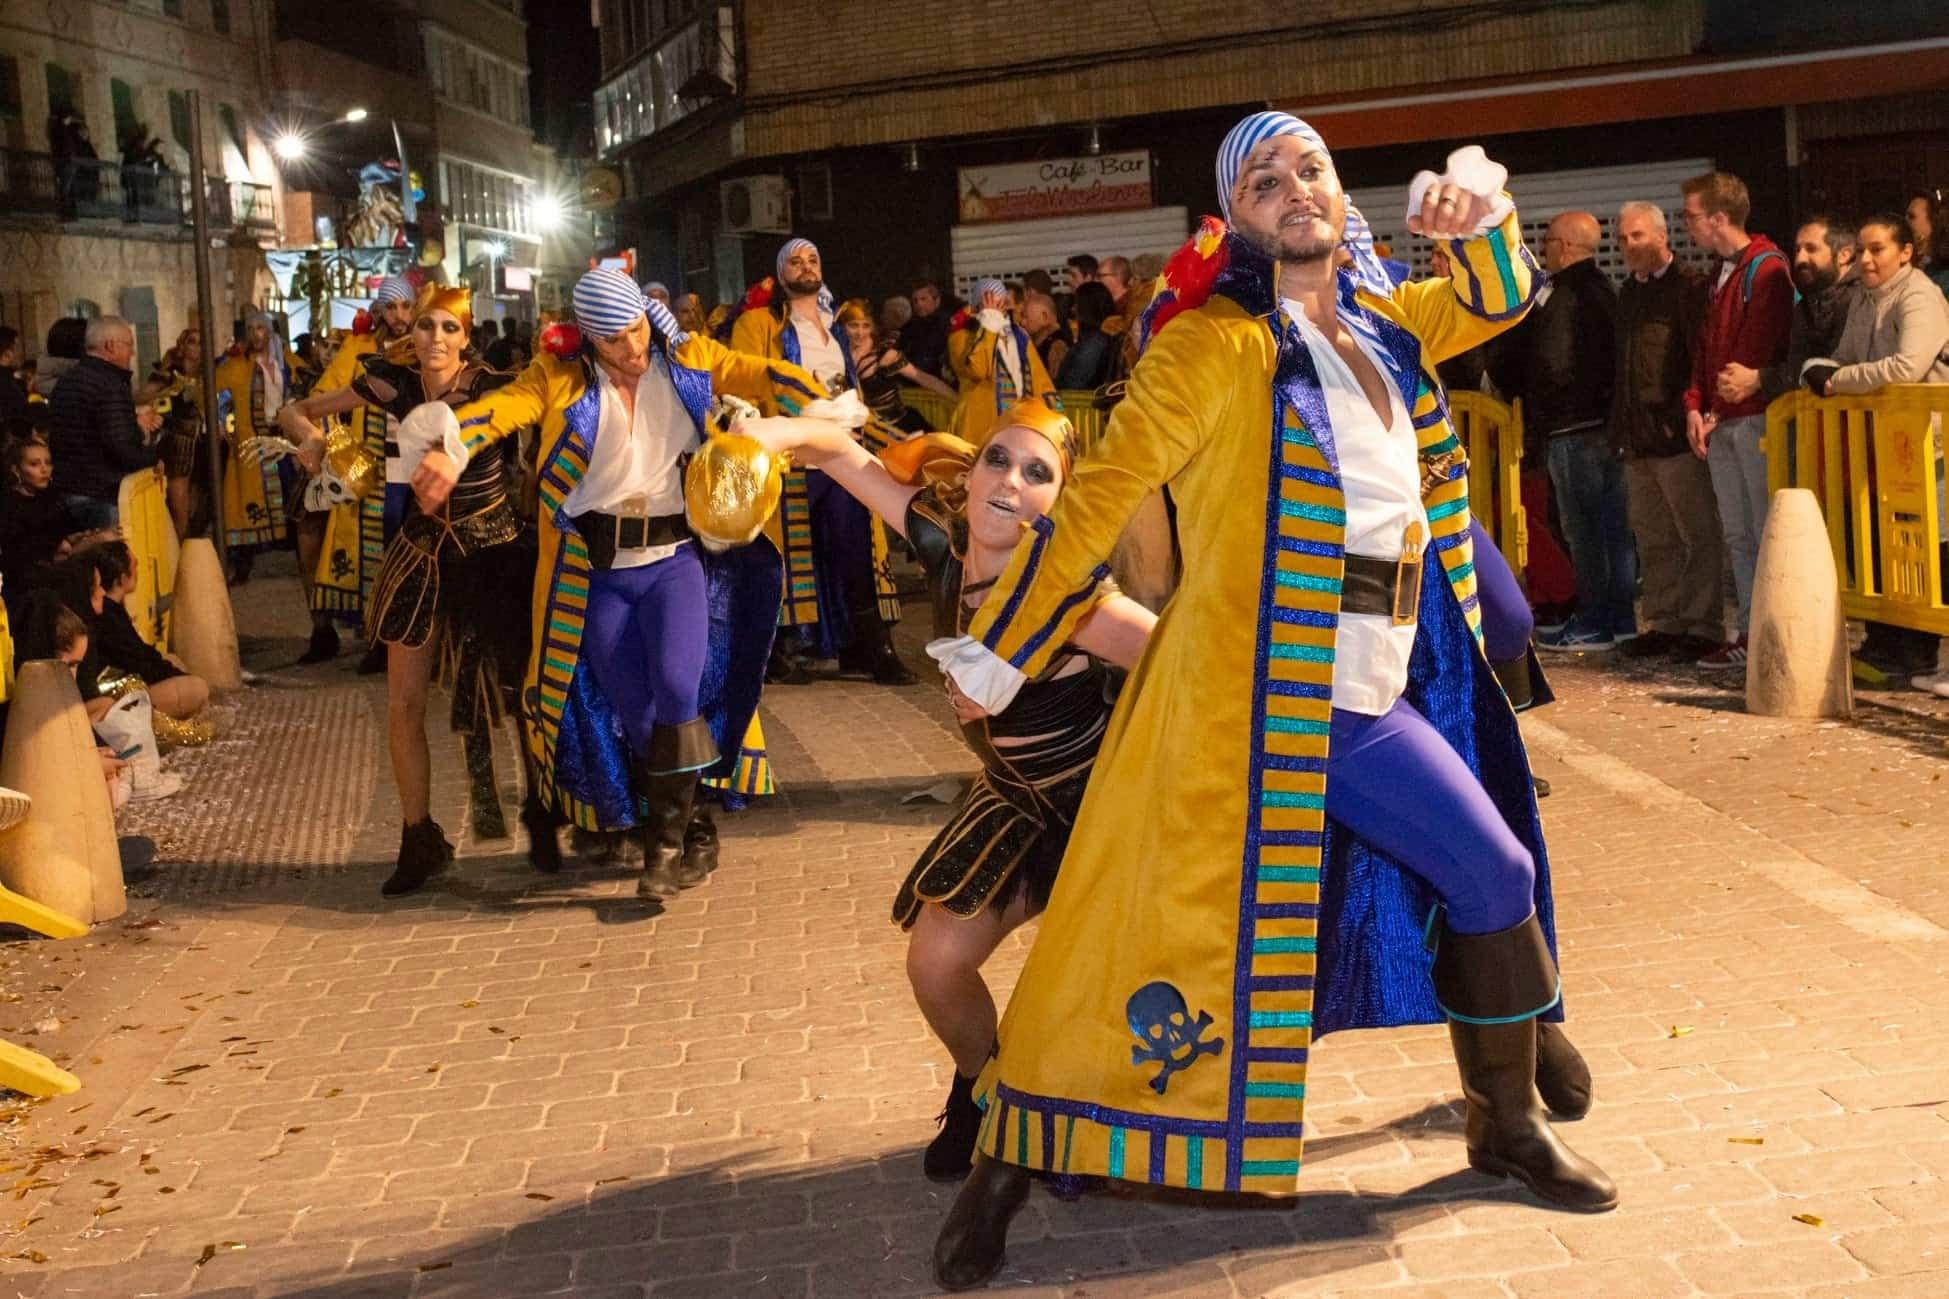 Carnaval de herencia 2020 ofertorio 48 - Selección de fotografías del Ofertorio del Carnaval de Herencia